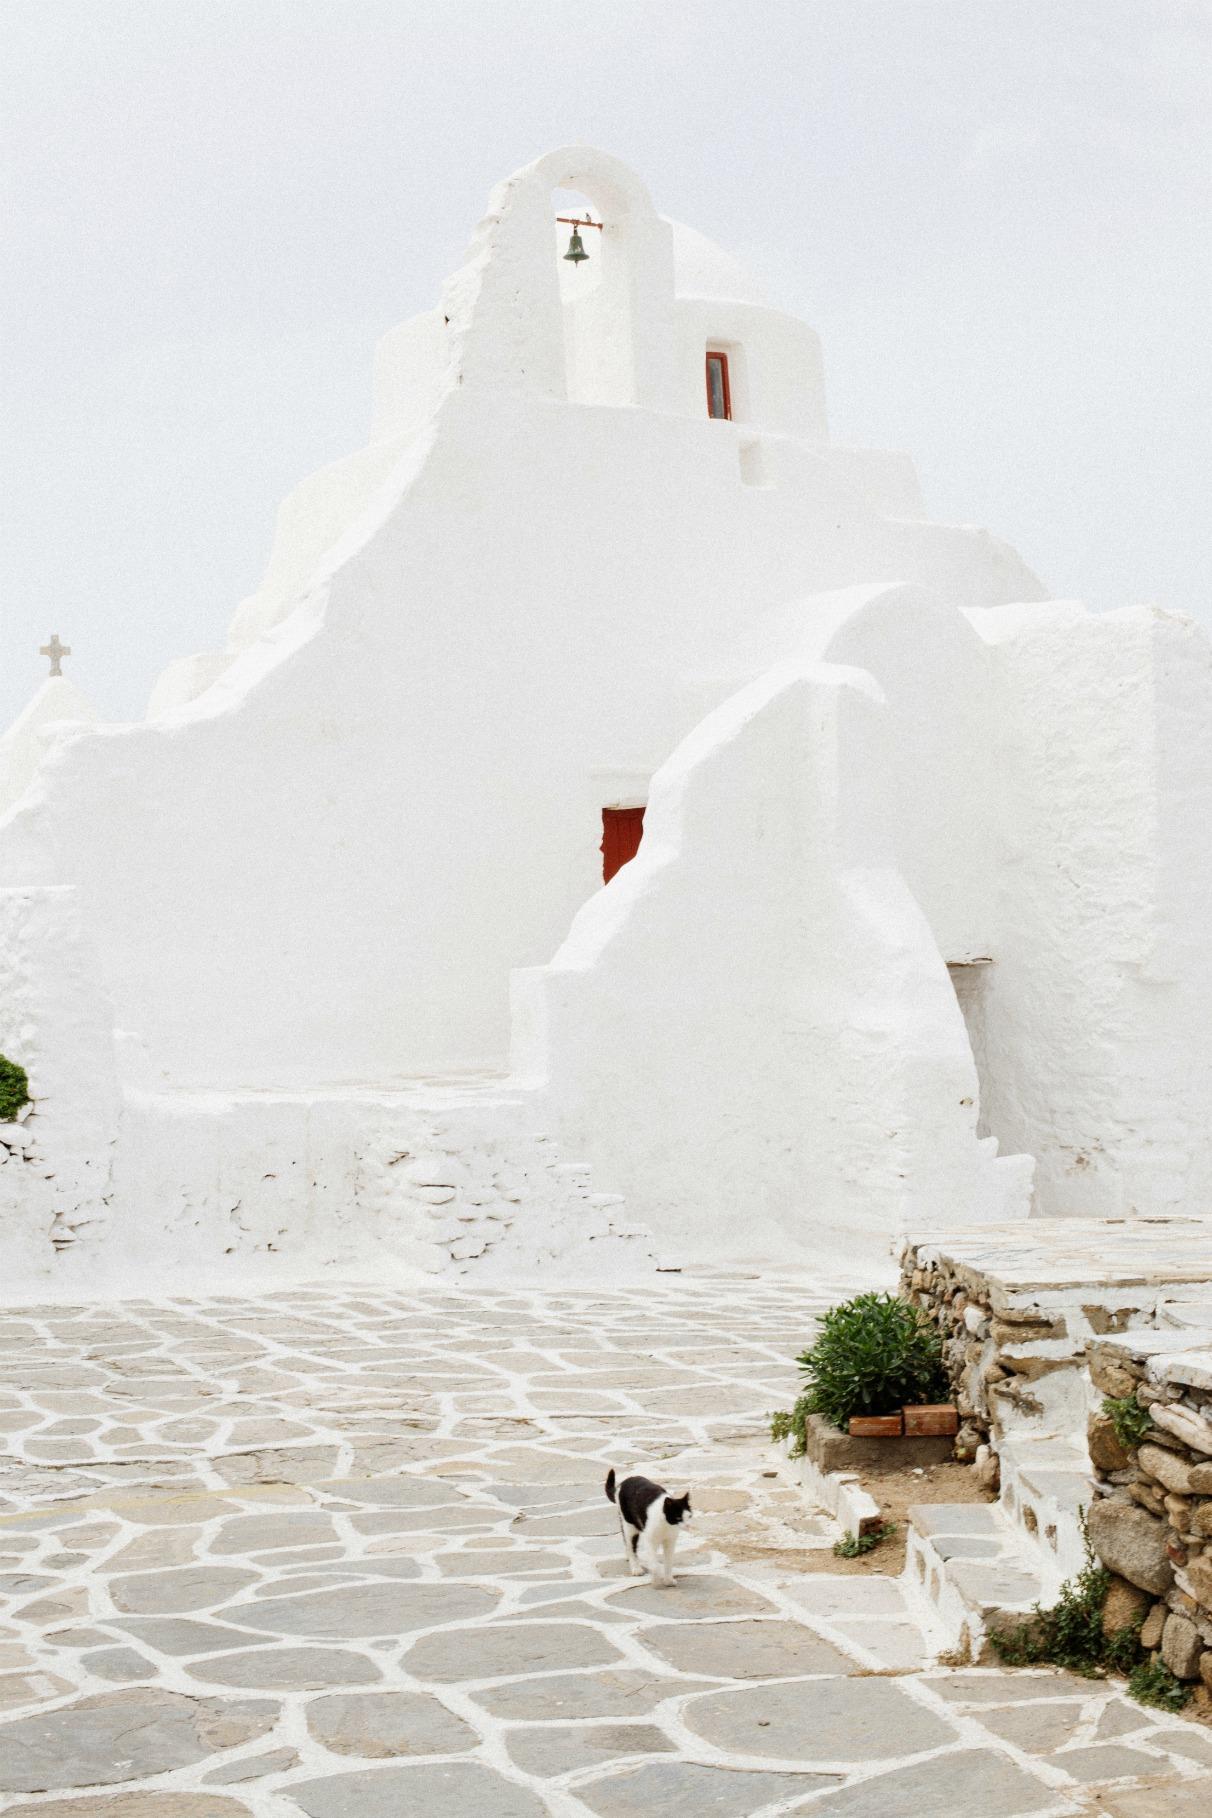 wind-mills-mykonos-town-2016-holidays-vacay-disi-couture-lemon-print-dress-22